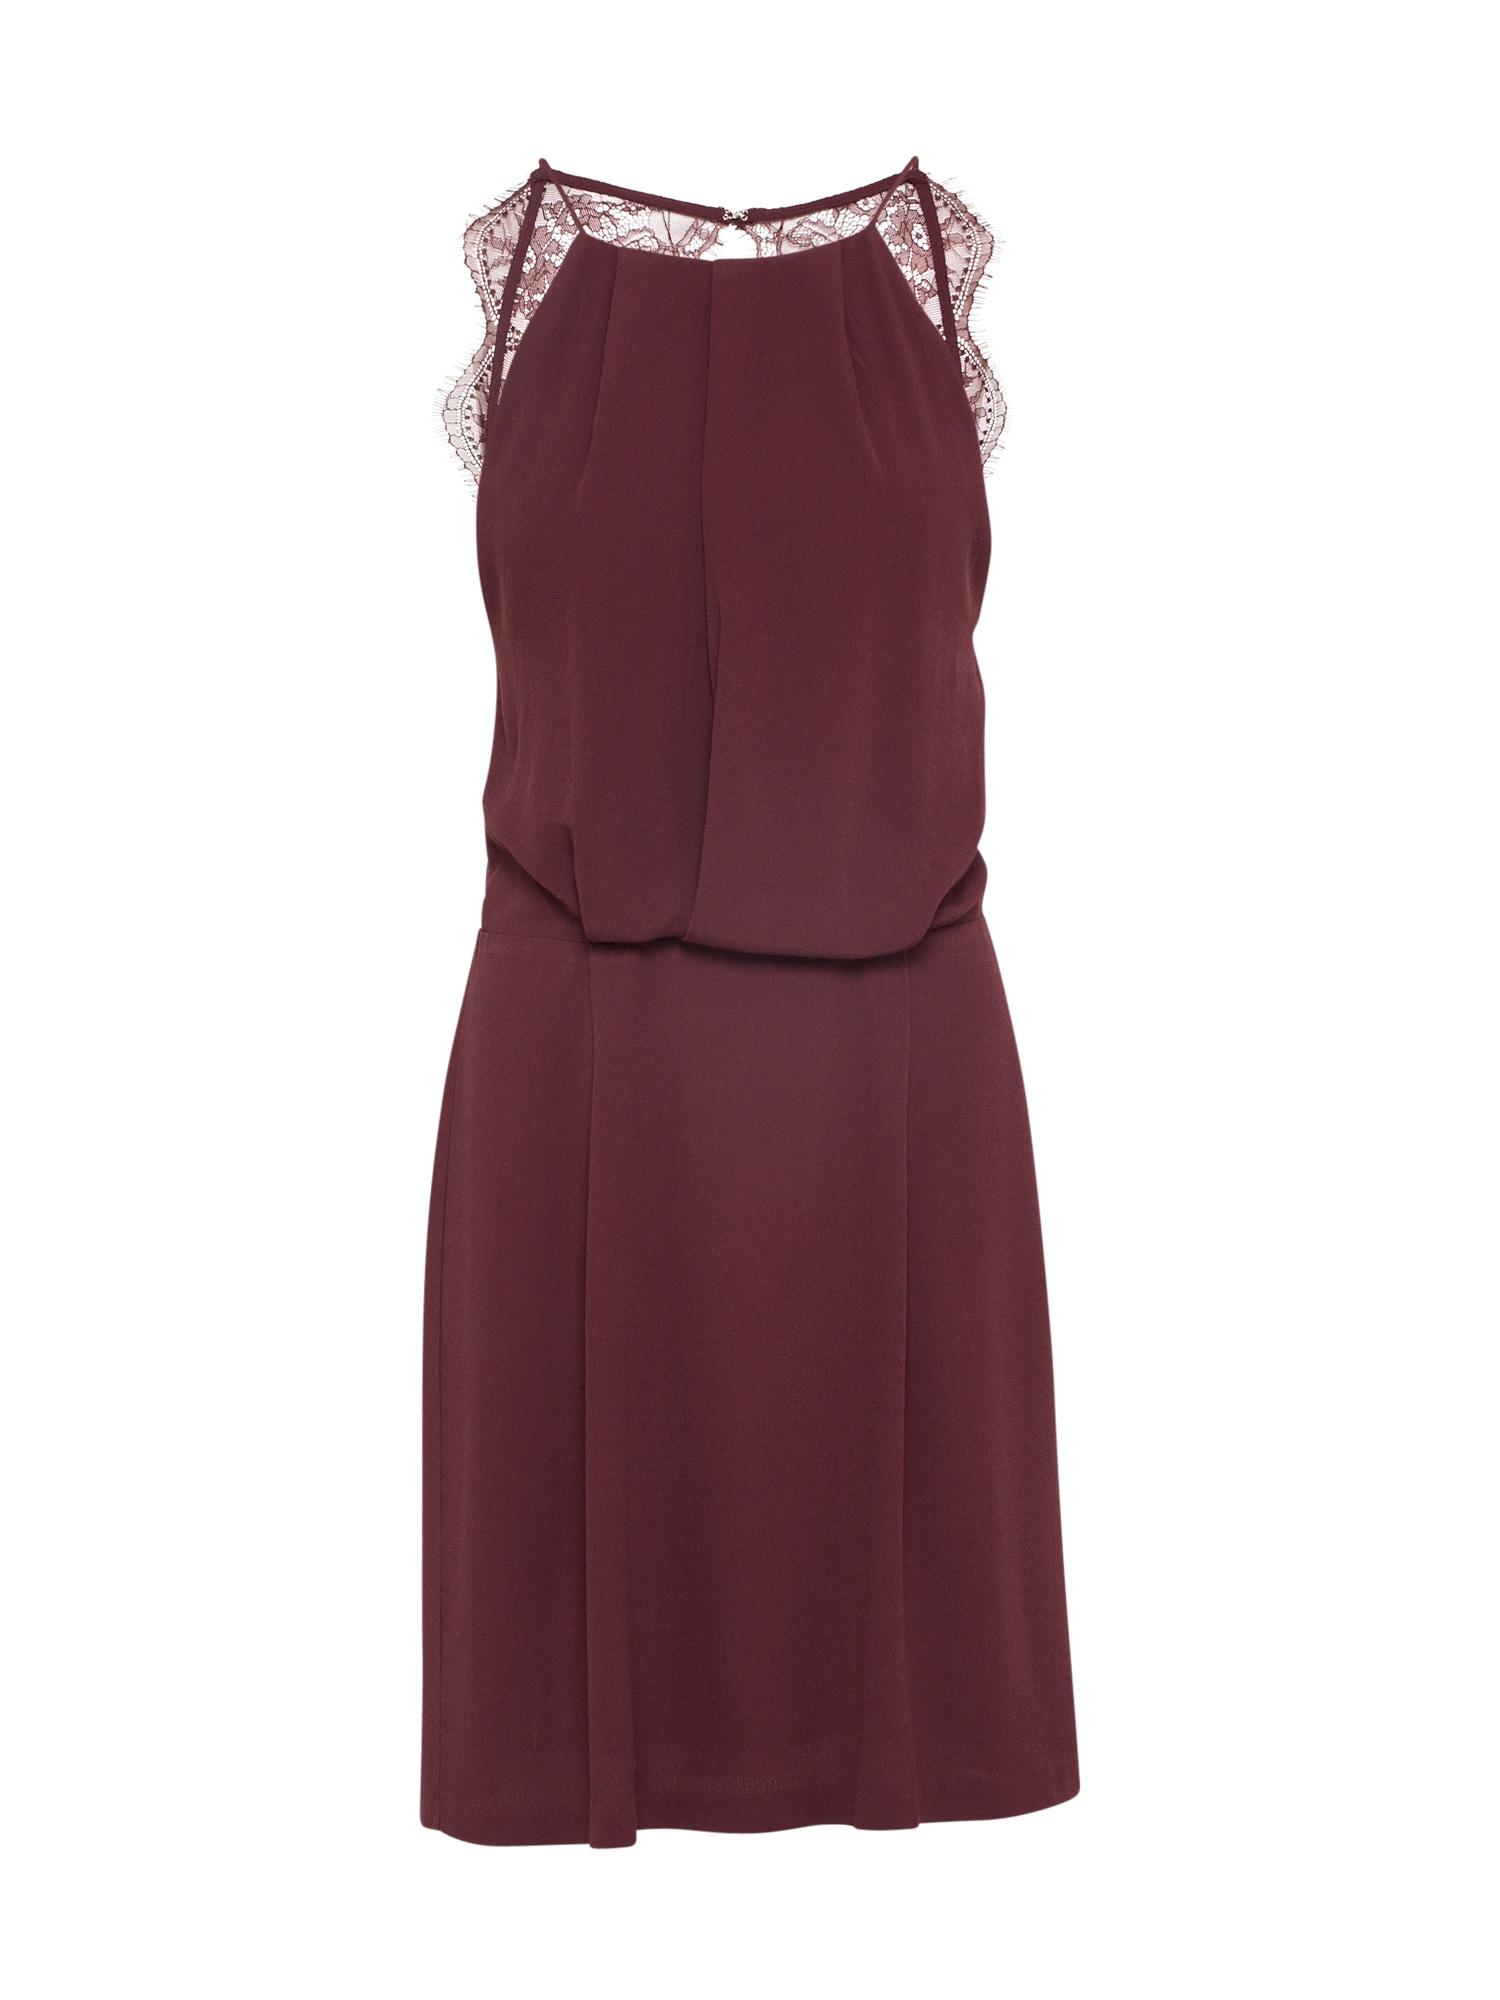 Letní šaty Willow 5687 lilek Samsoe & Samsoe